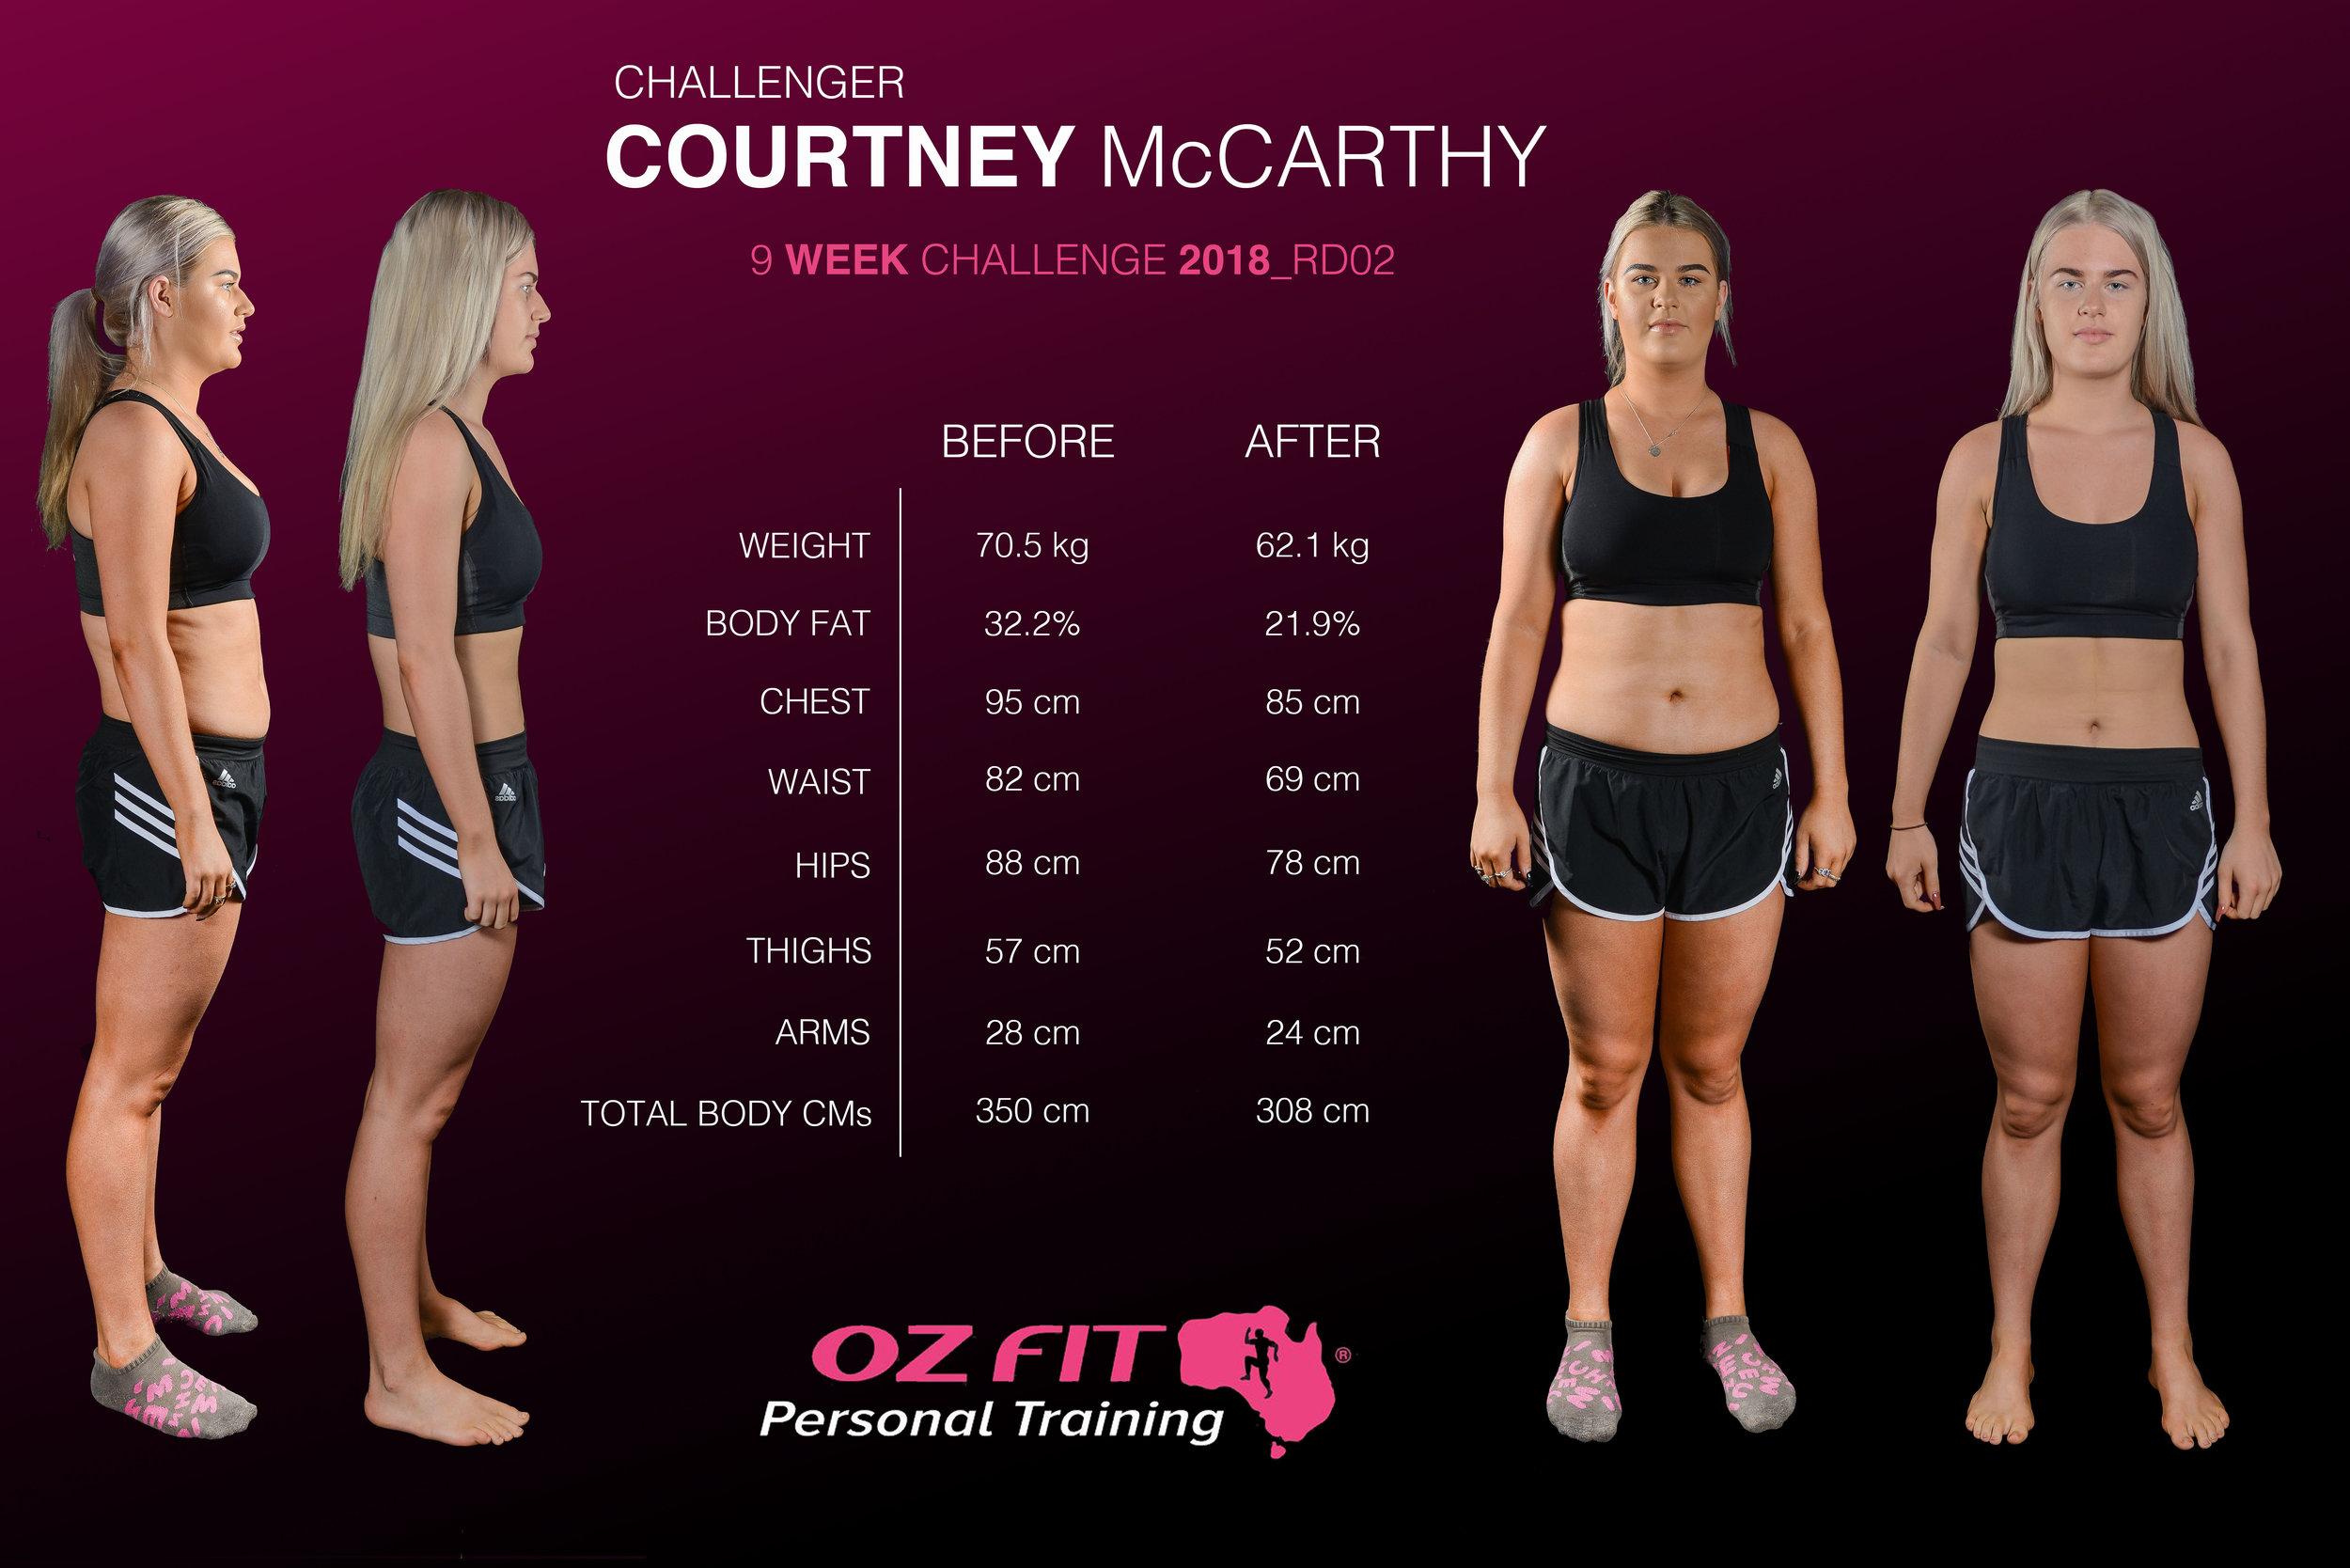 CourtneyMcCarthy.jpg